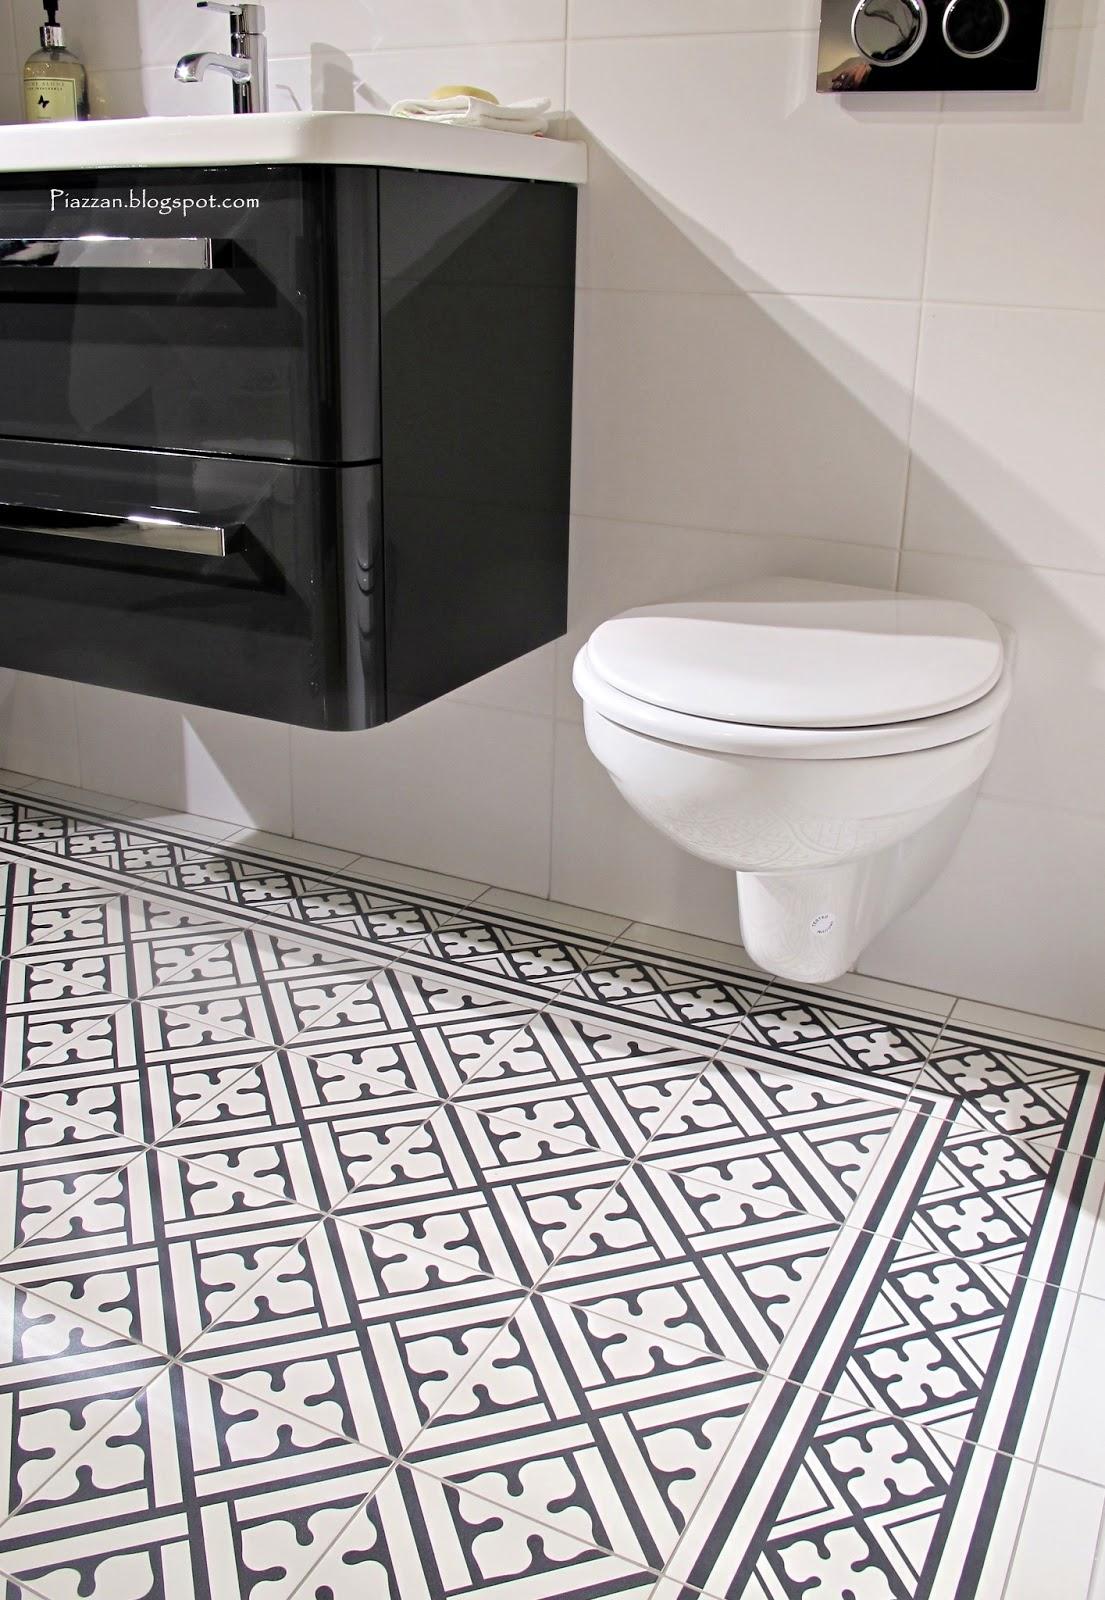 Badrum kakla om badrum : Piazzan: Marockanskt kakel till badrummet